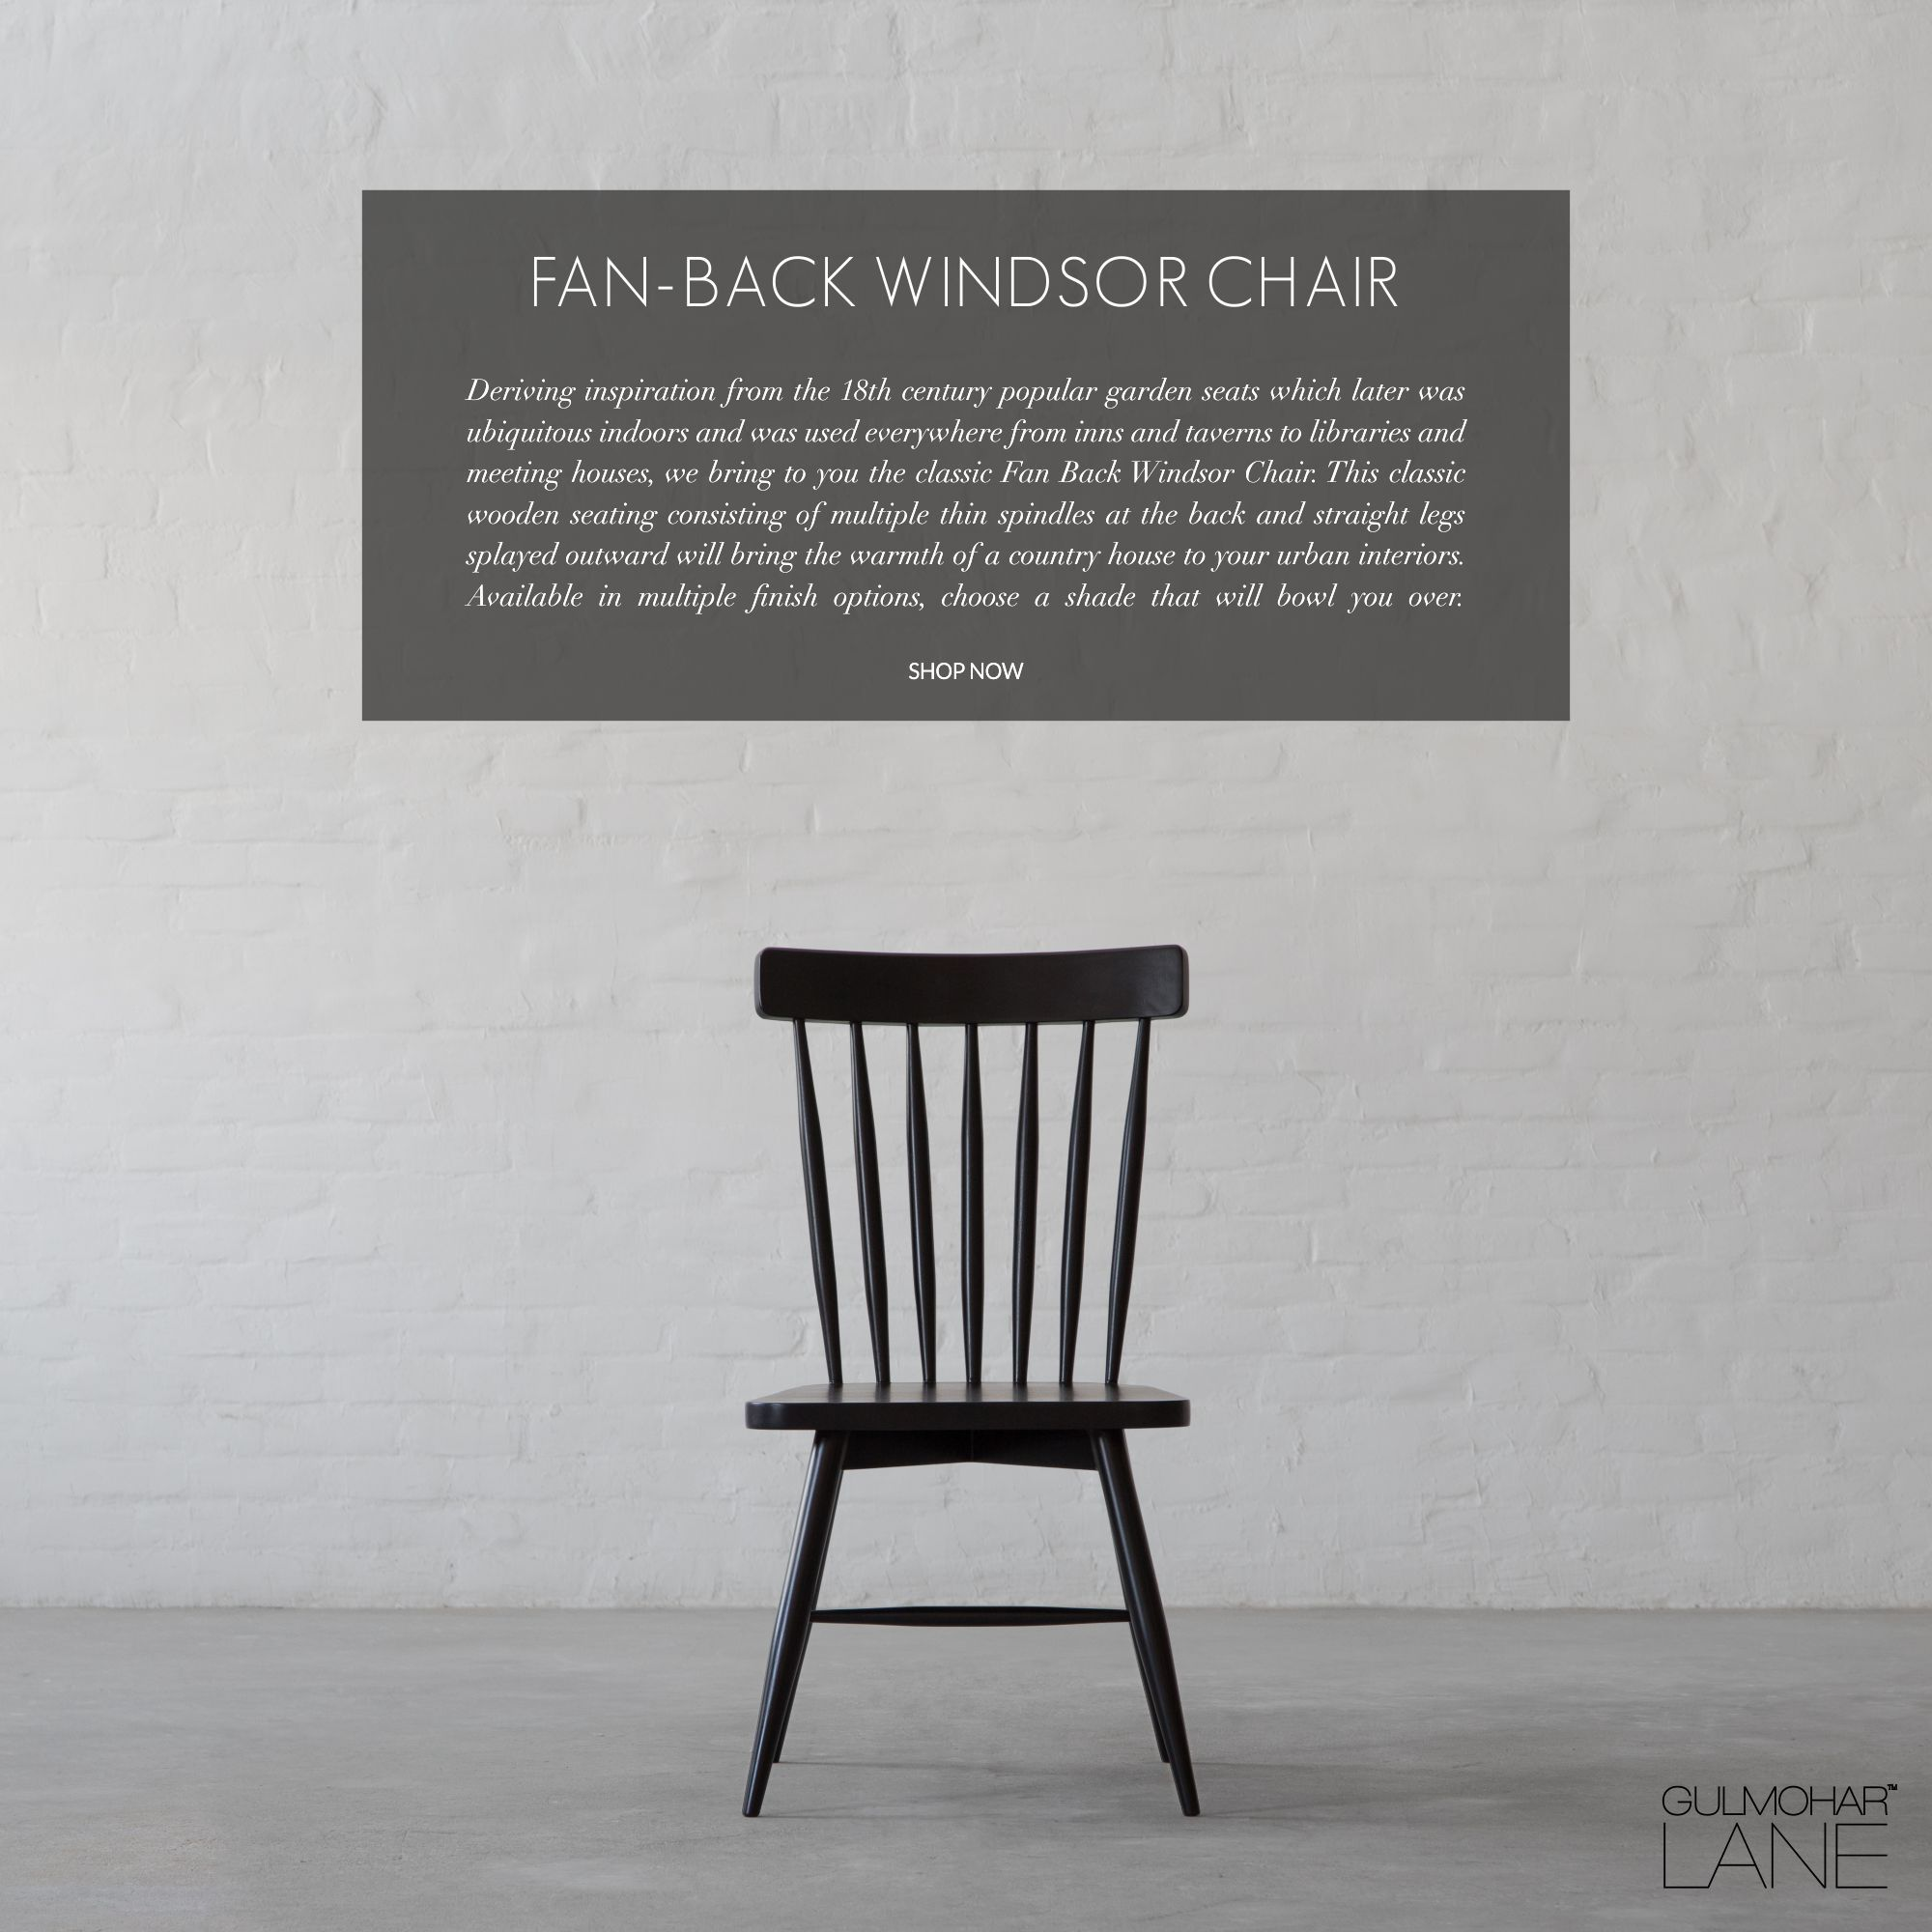 deriving inspiration from the 18th century popular garden seats rh pinterest com